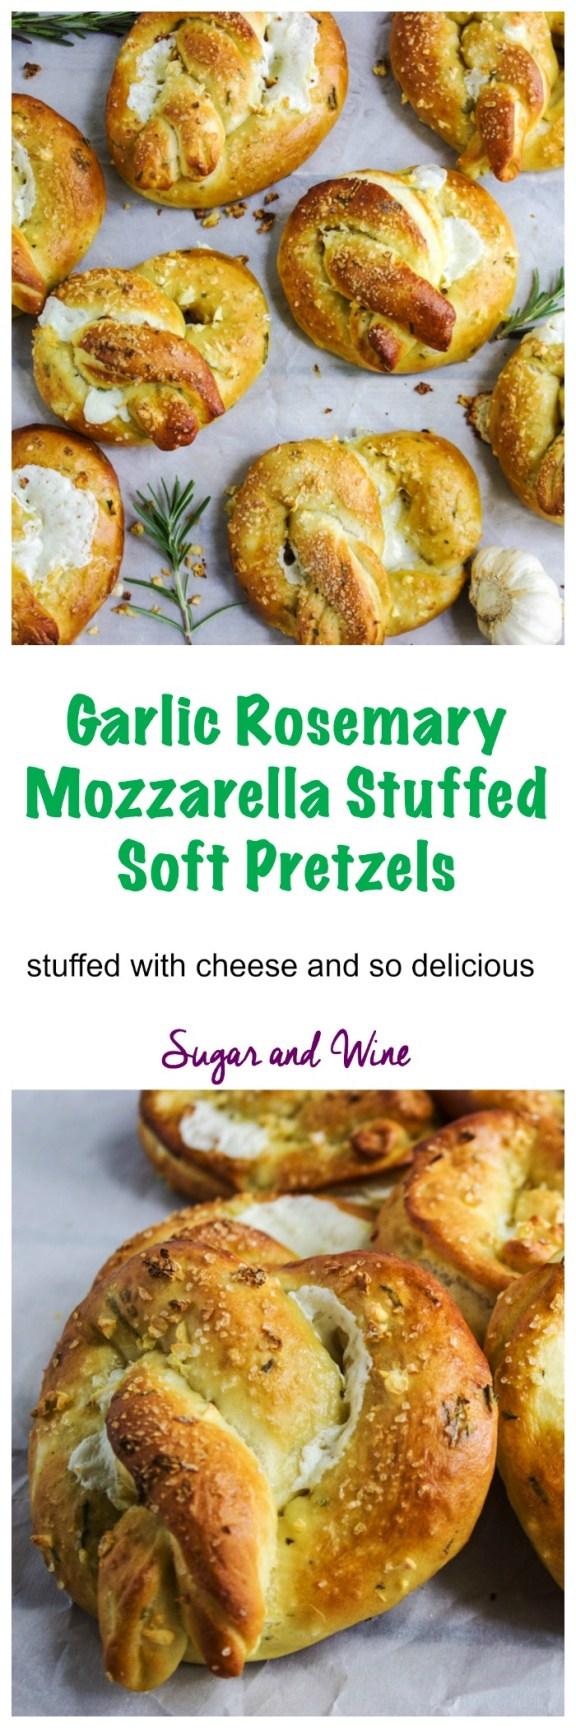 Garlic Rosemary Mozzarella Stuffed Soft Pretzels | Sugar and Wine